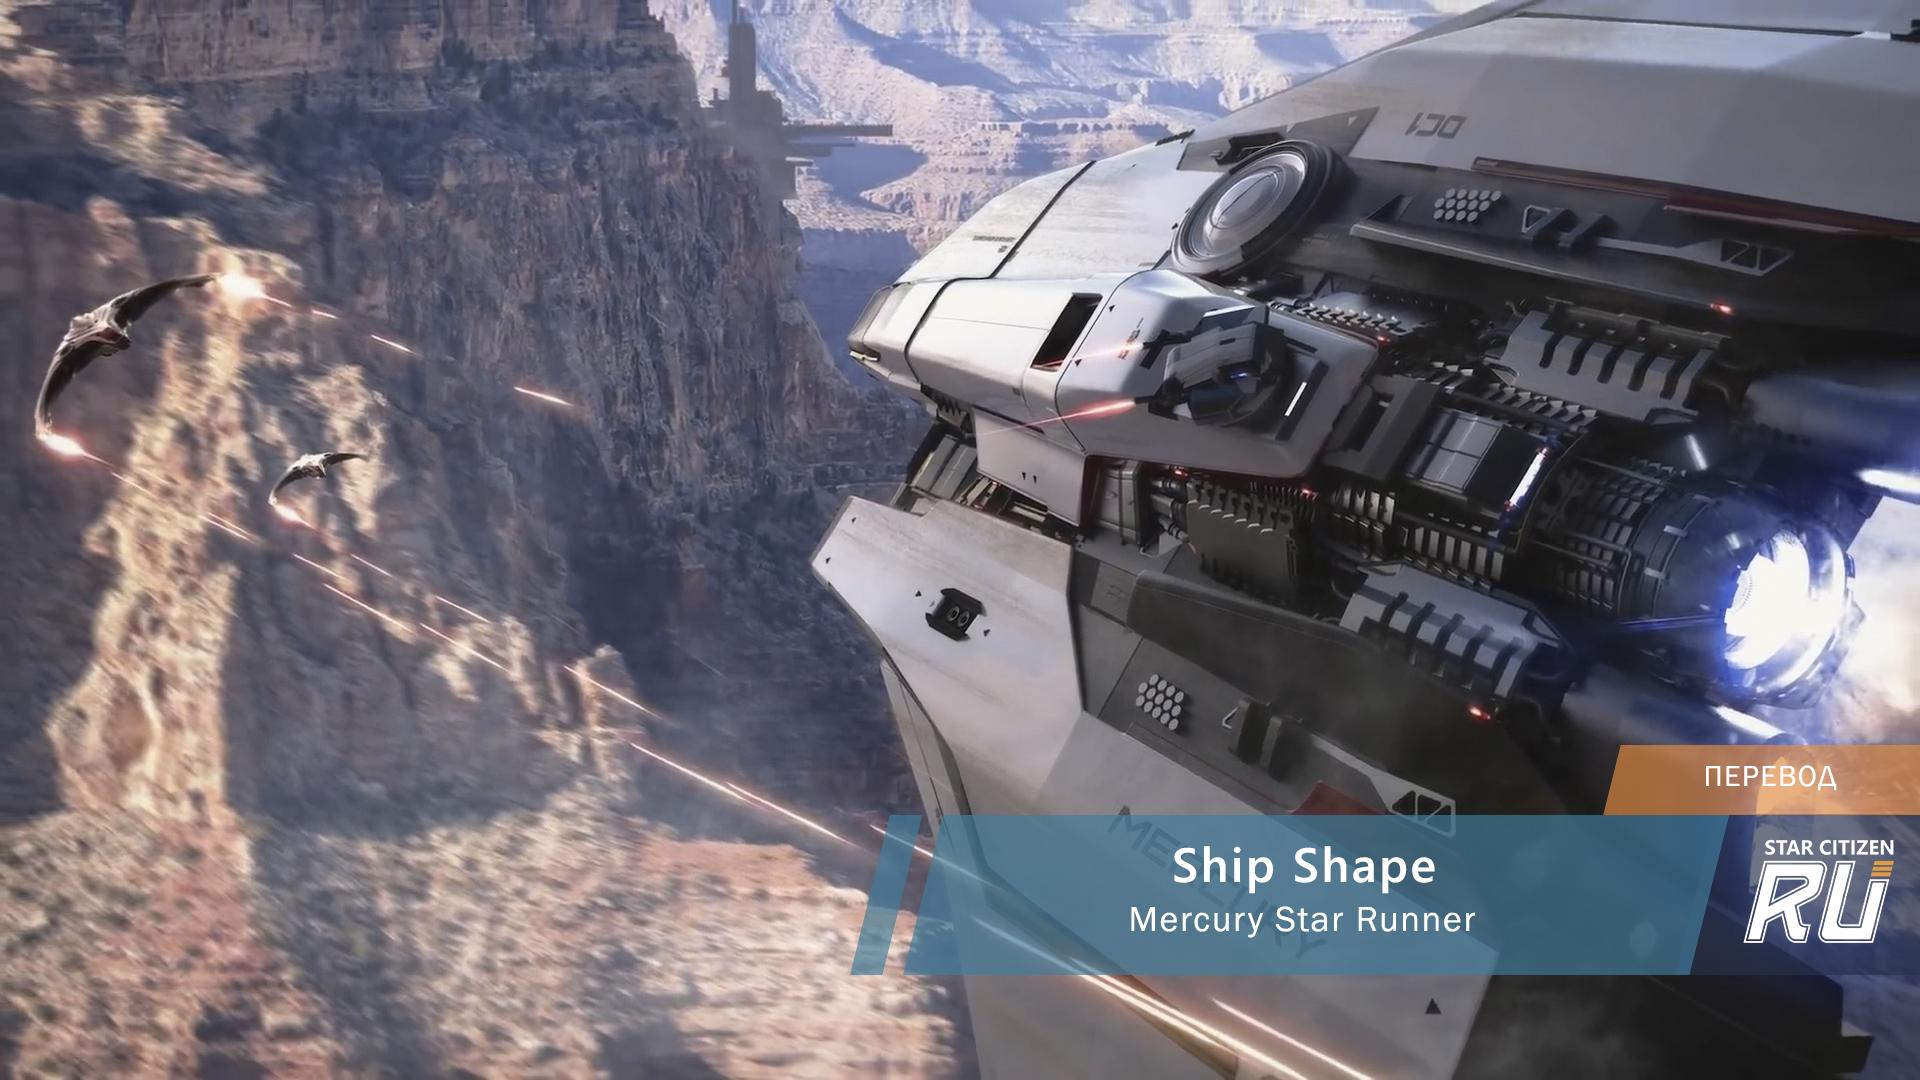 Ship Shape - Mercury Star Runner